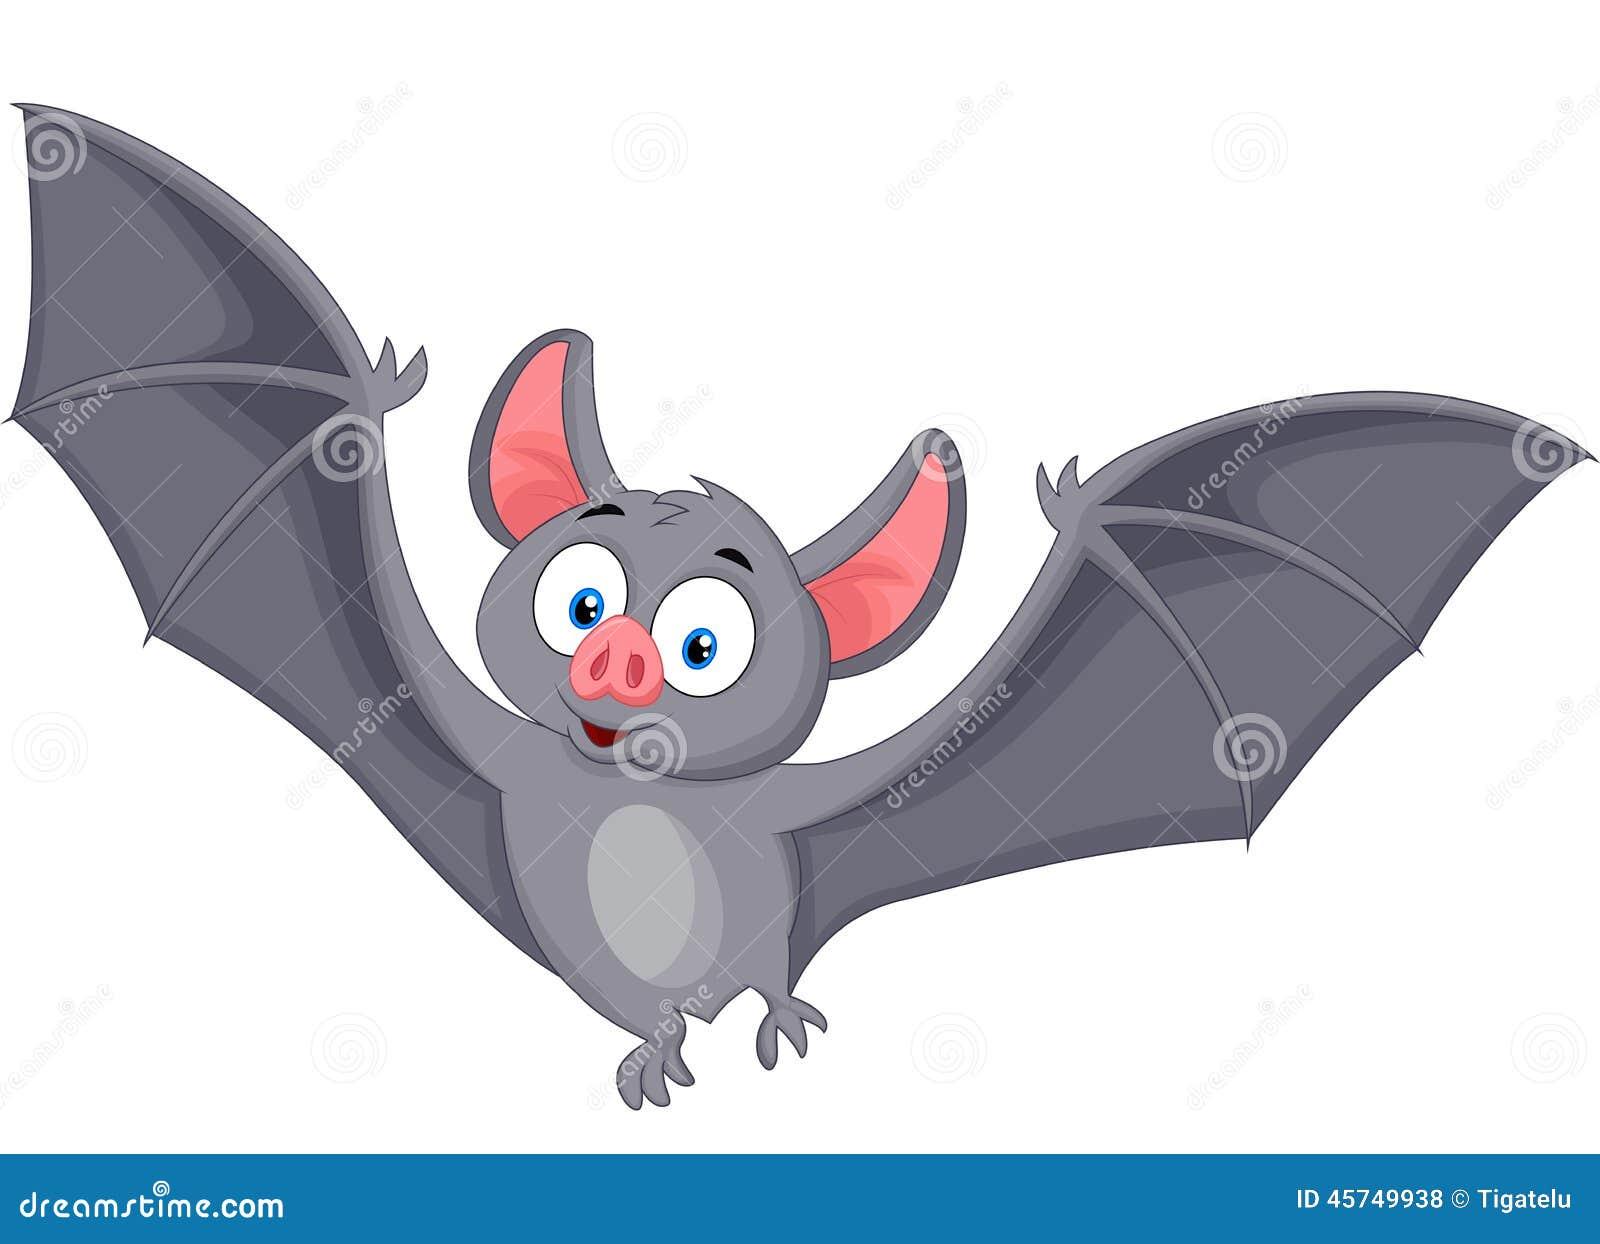 Vol de bande dessin e de chauve souris illustration de vecteur image 45749938 - Image de chauve souris ...